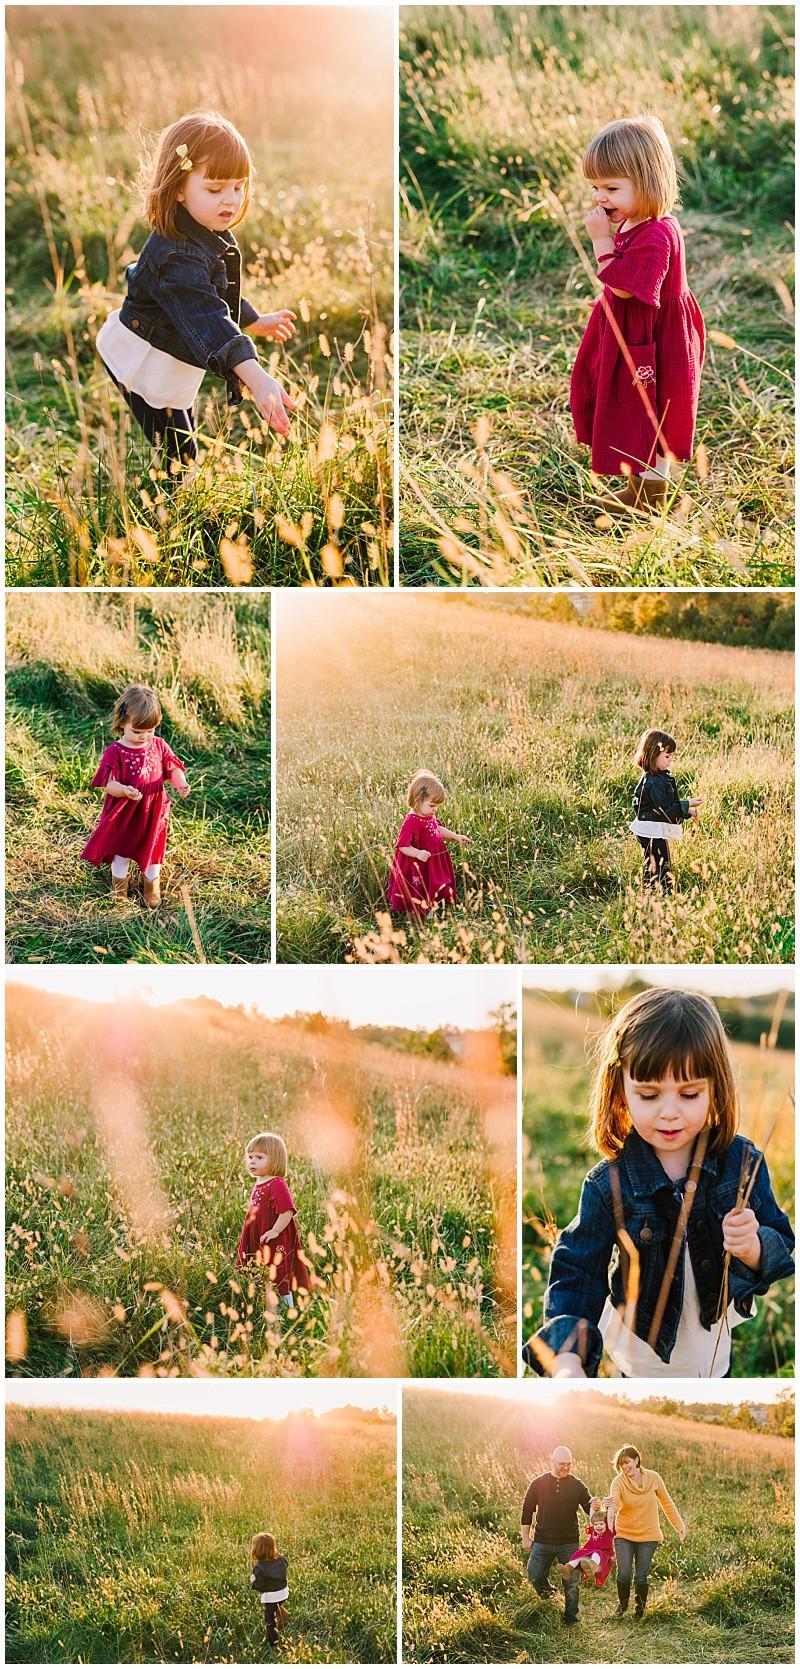 Fall Family Photography Inspiration